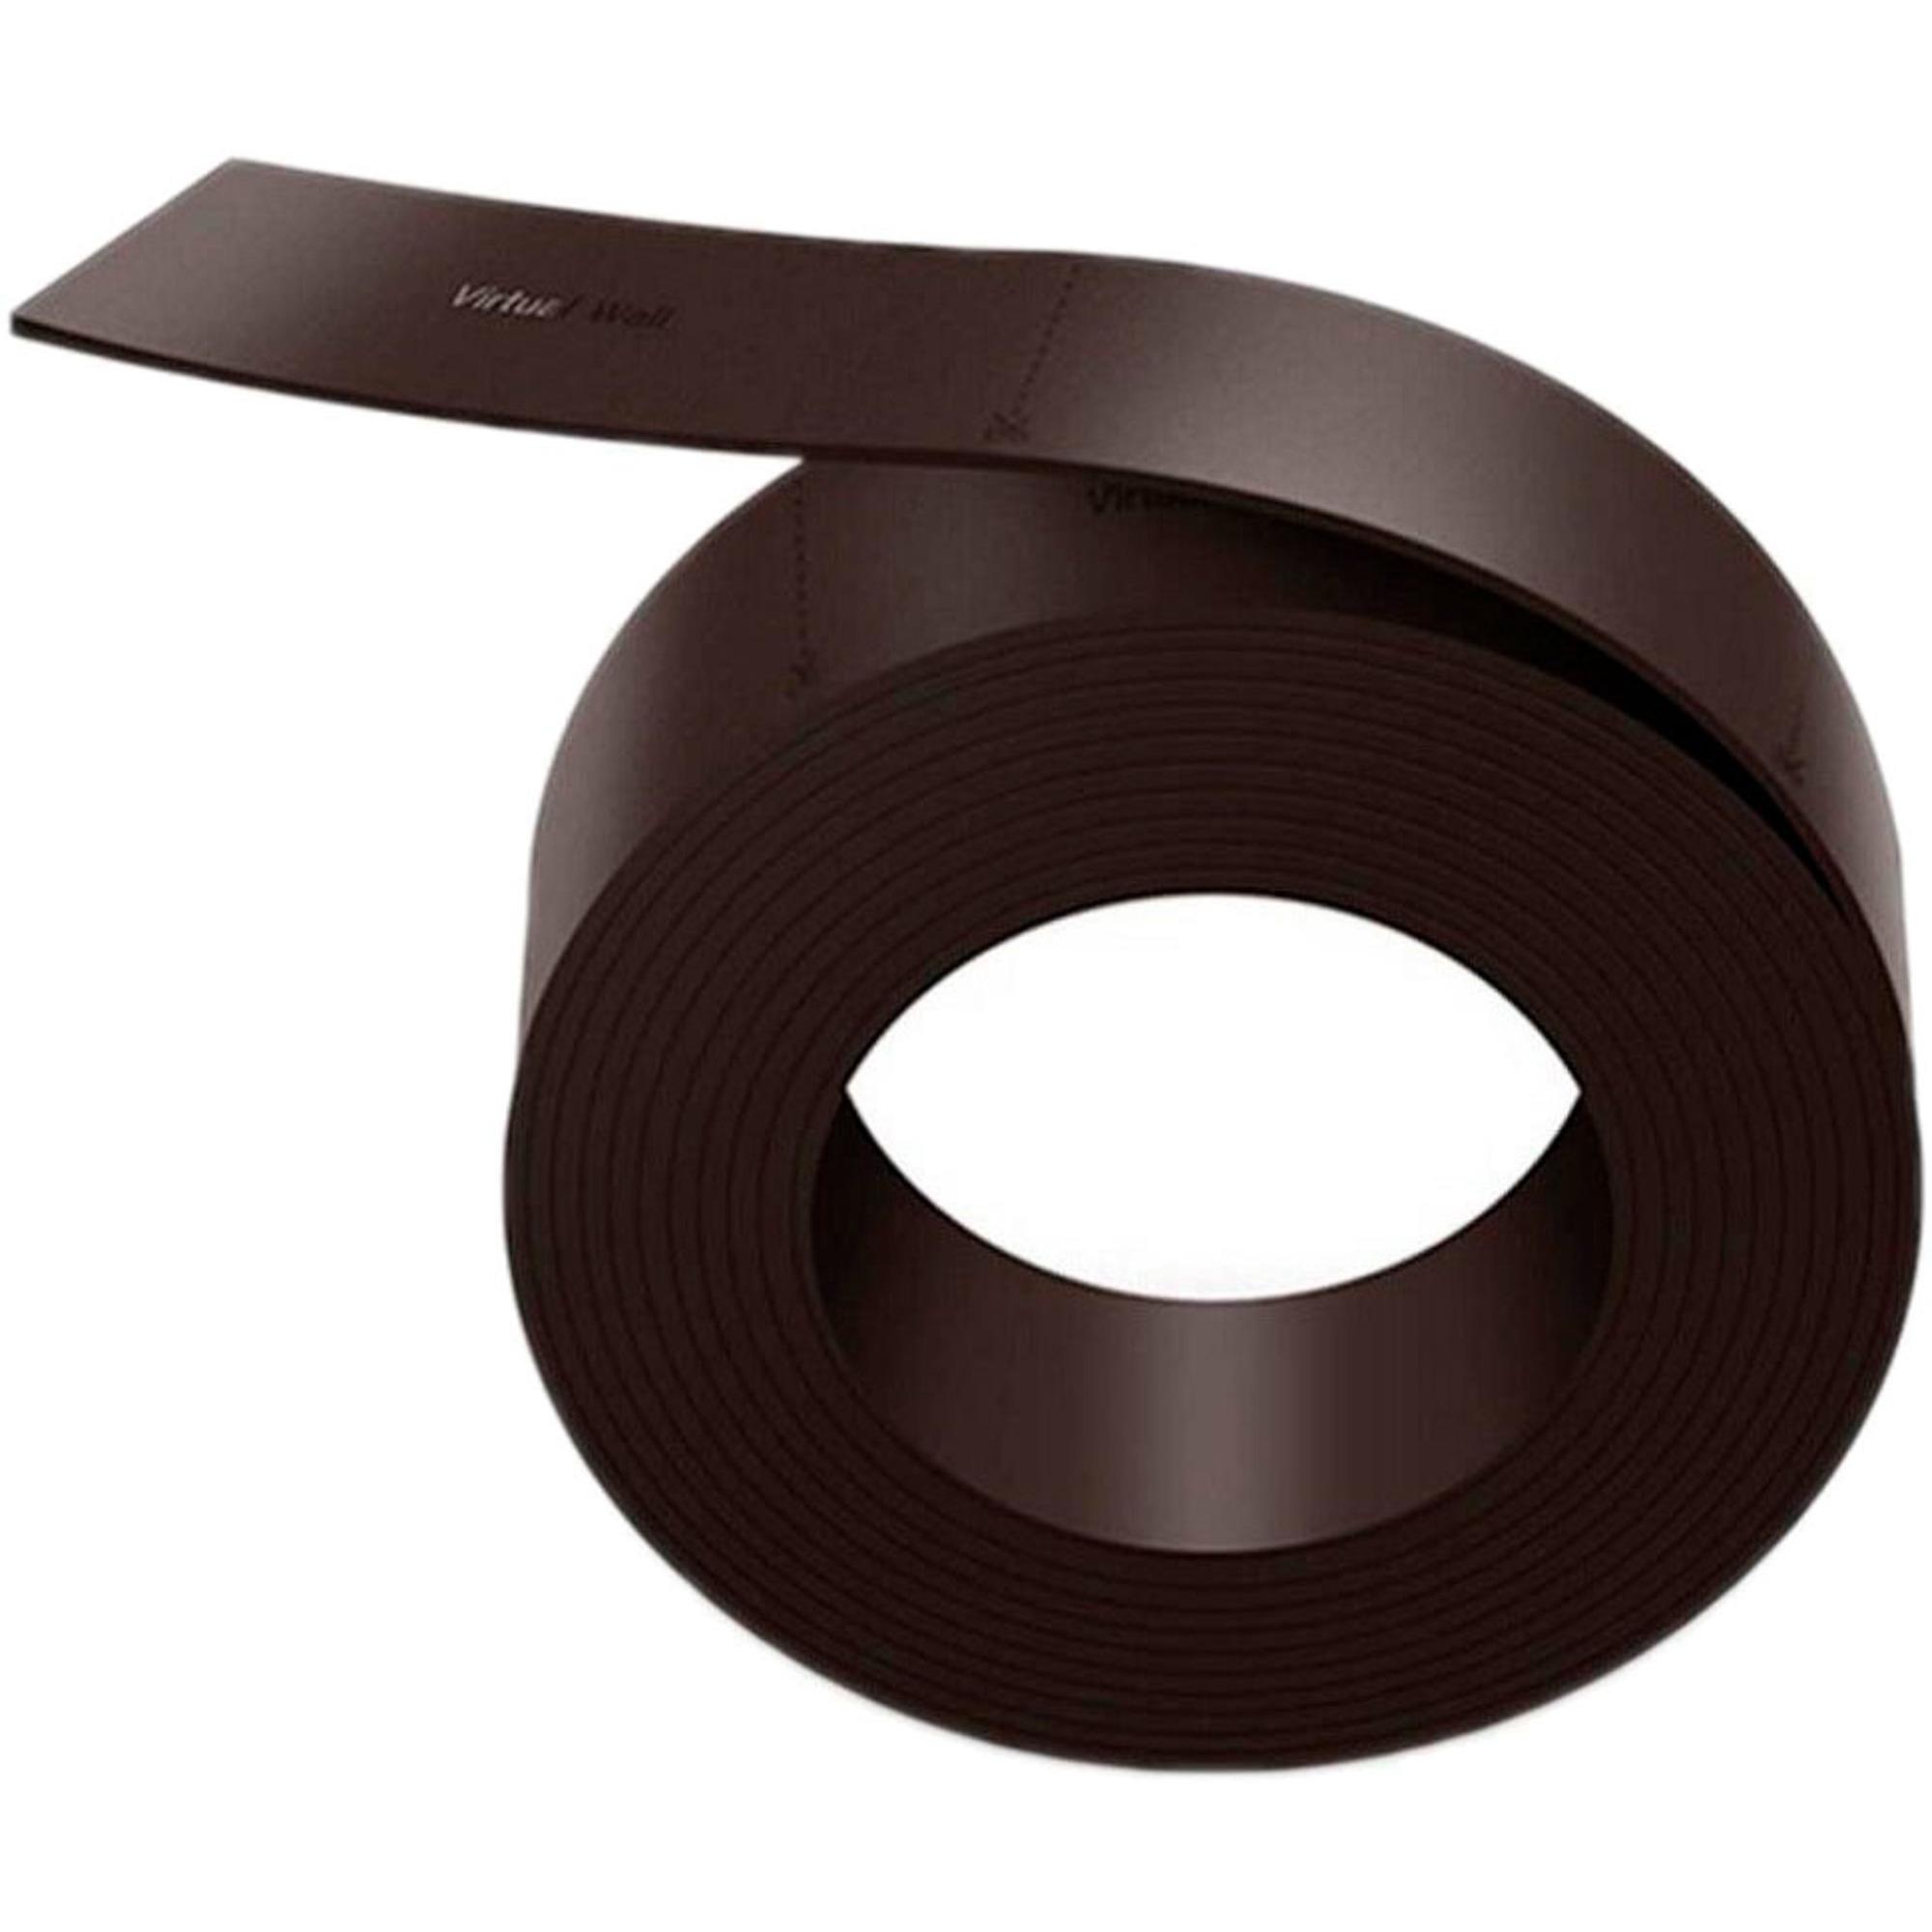 Xiaomi Roborock magnetband, 2 meter